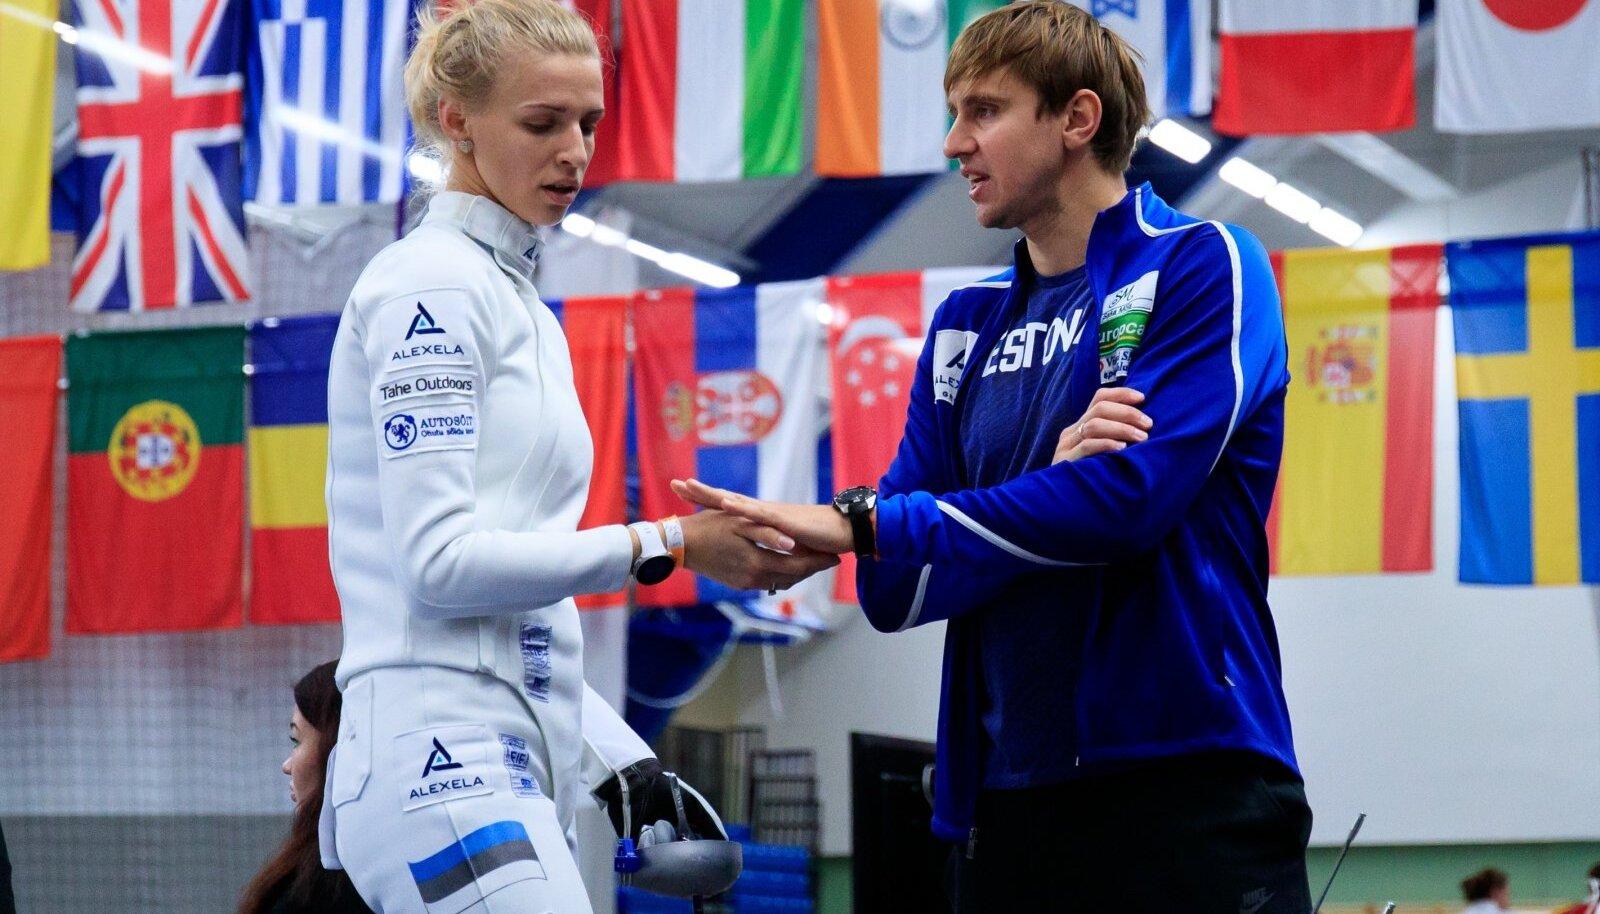 Katrina Lehis ja  Nikolai Novosjolov